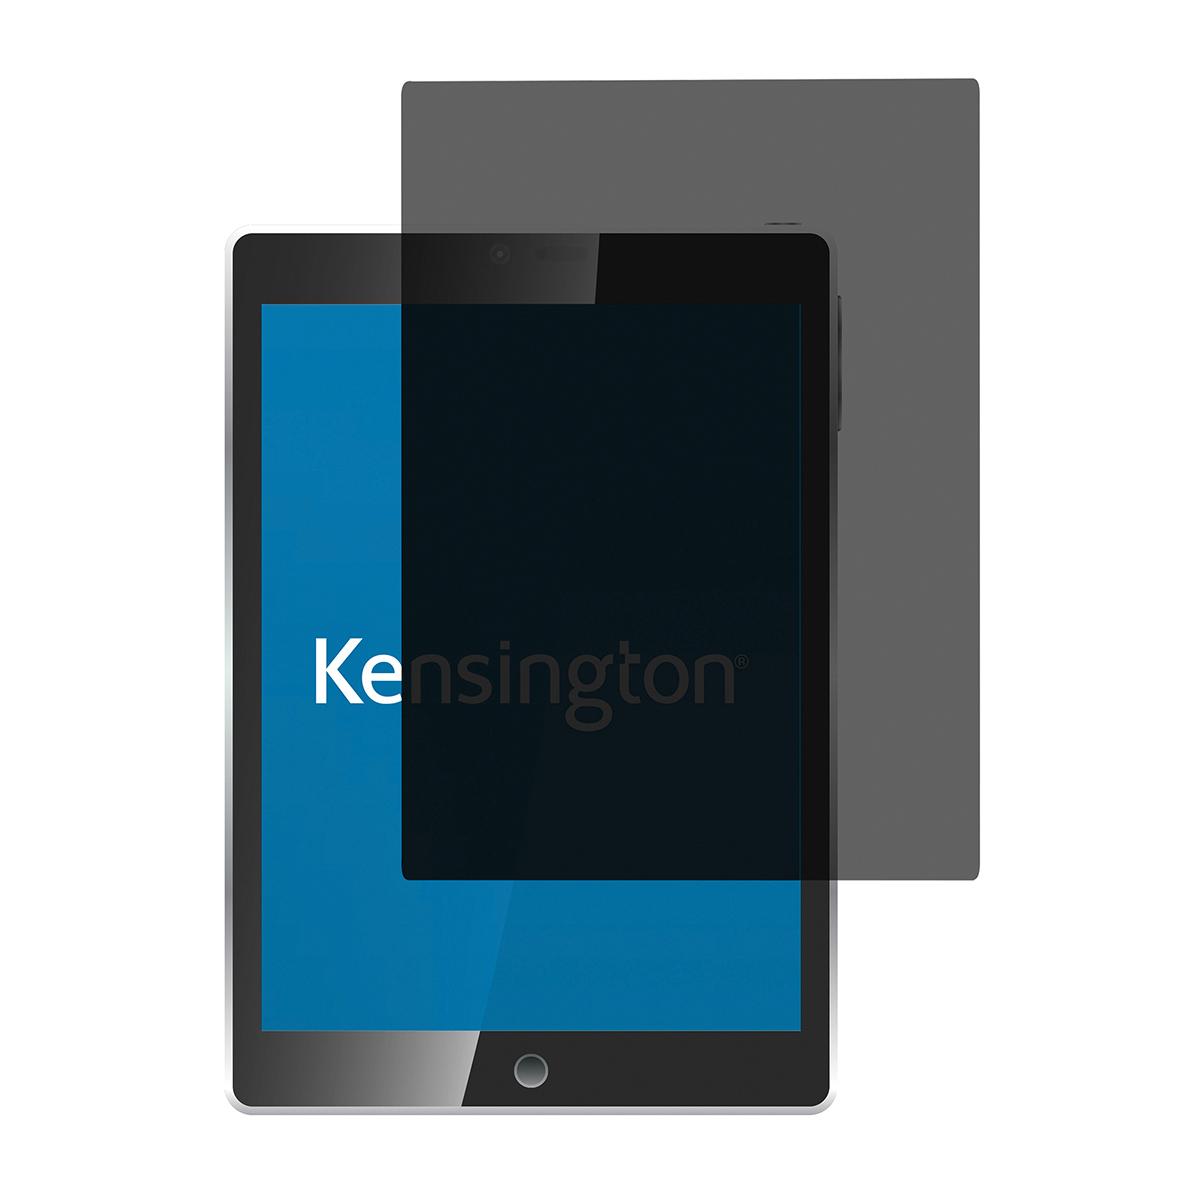 Kensington 626394 Privacy Filter 4 Way Adhesive for iPad Air - iPad Pro 9.7 Inch - iPad 2017